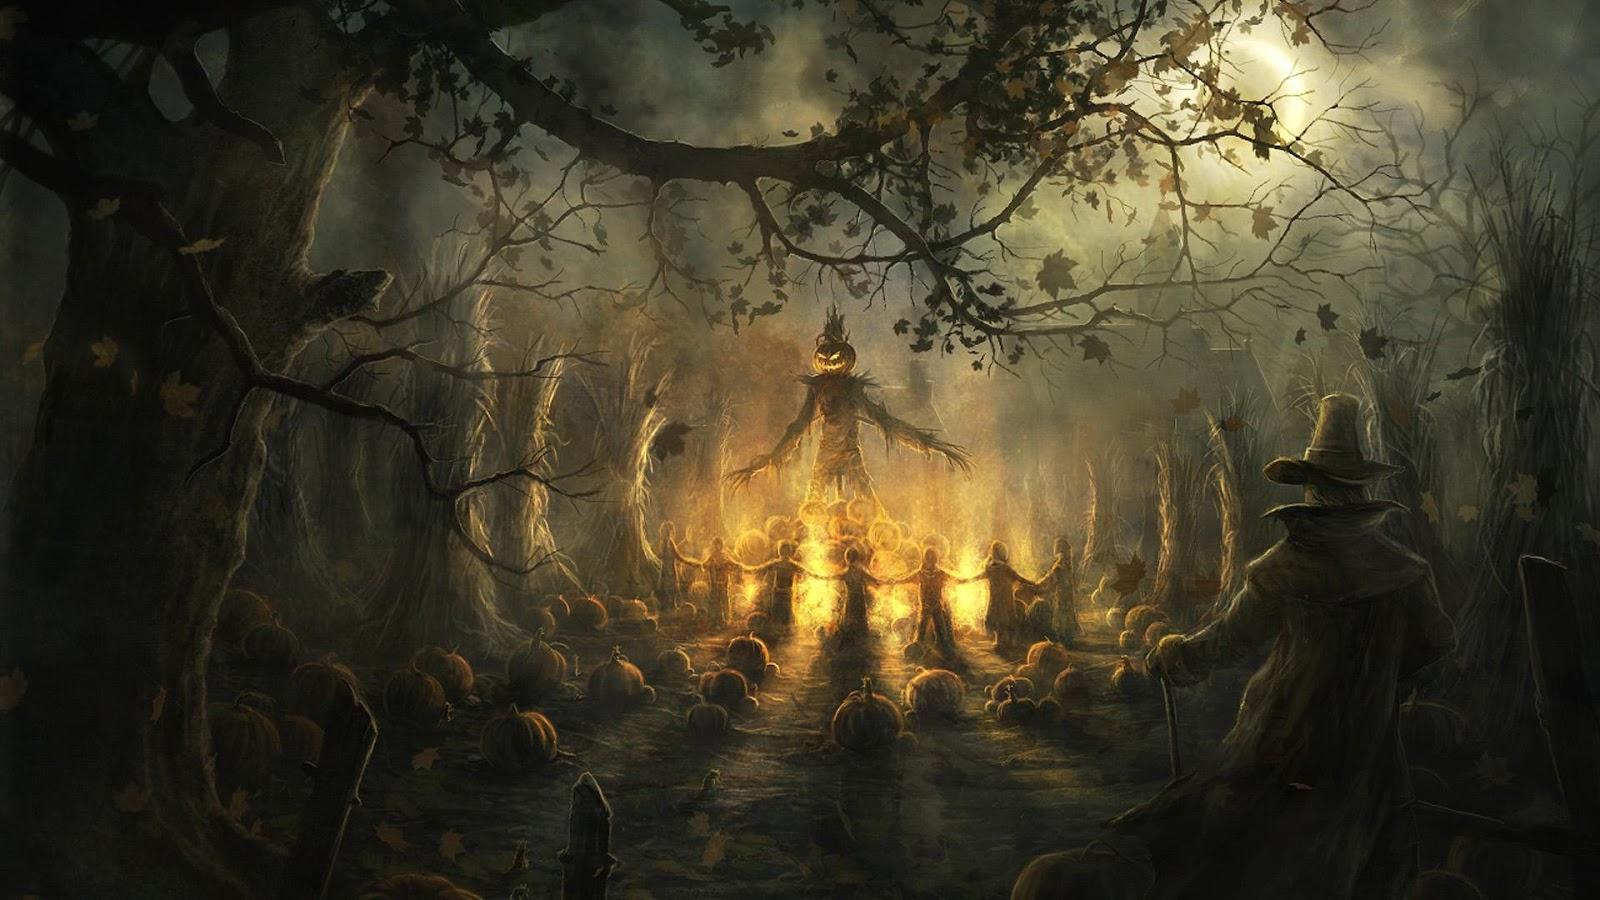 Halloween Scary Dark HD wallpaper for halloween 2014